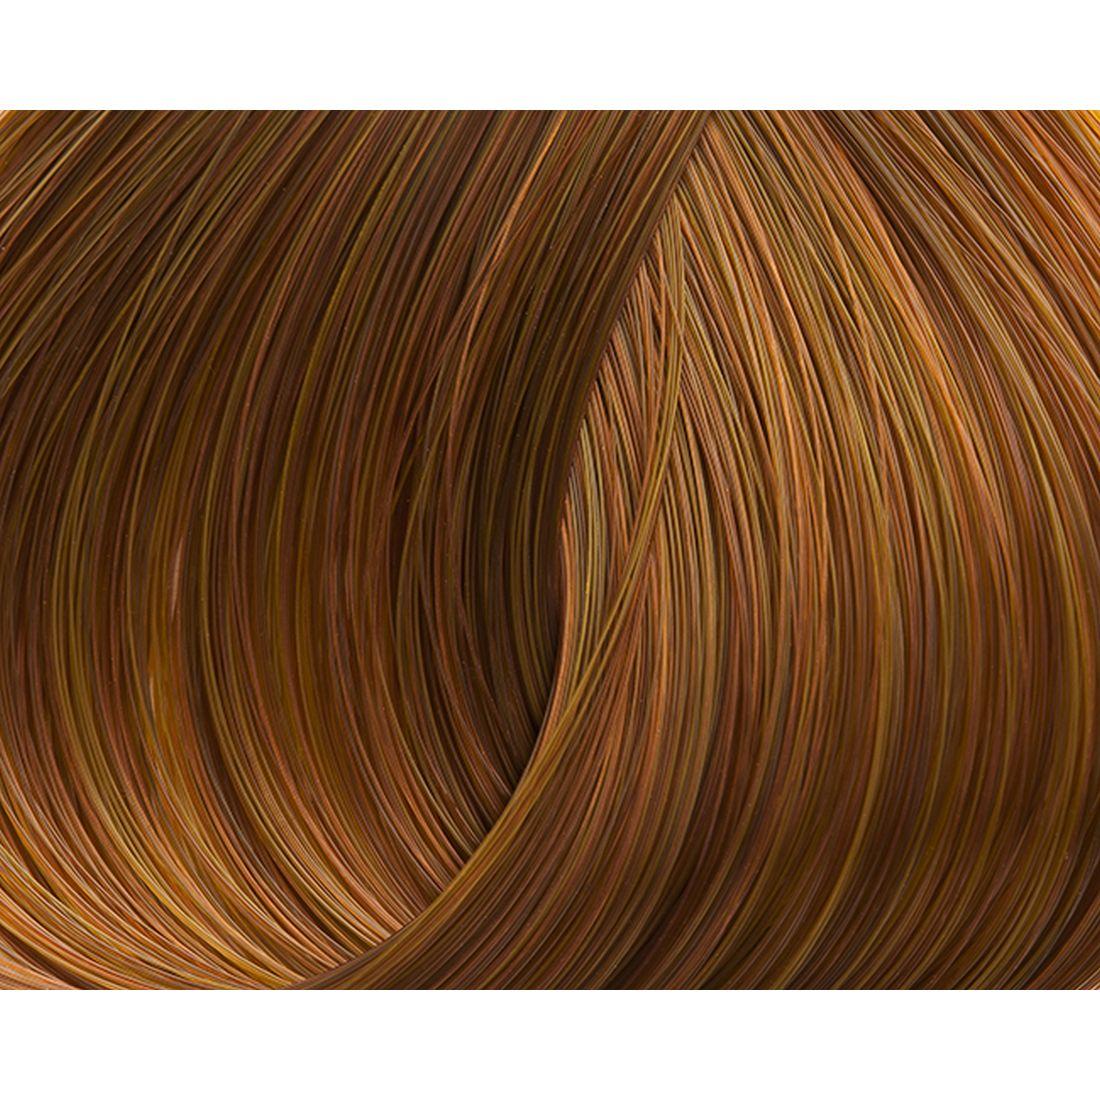 Lorvenn Beauty Color Επαγγελματική Βαφή Σωληνάριο 70ml No 8.34 Ξανθό Ανοιχτό Ντορέ Χάλκινο No 8.34 Ξανθό Ανοιχτό Ντορέ Χάλκινο